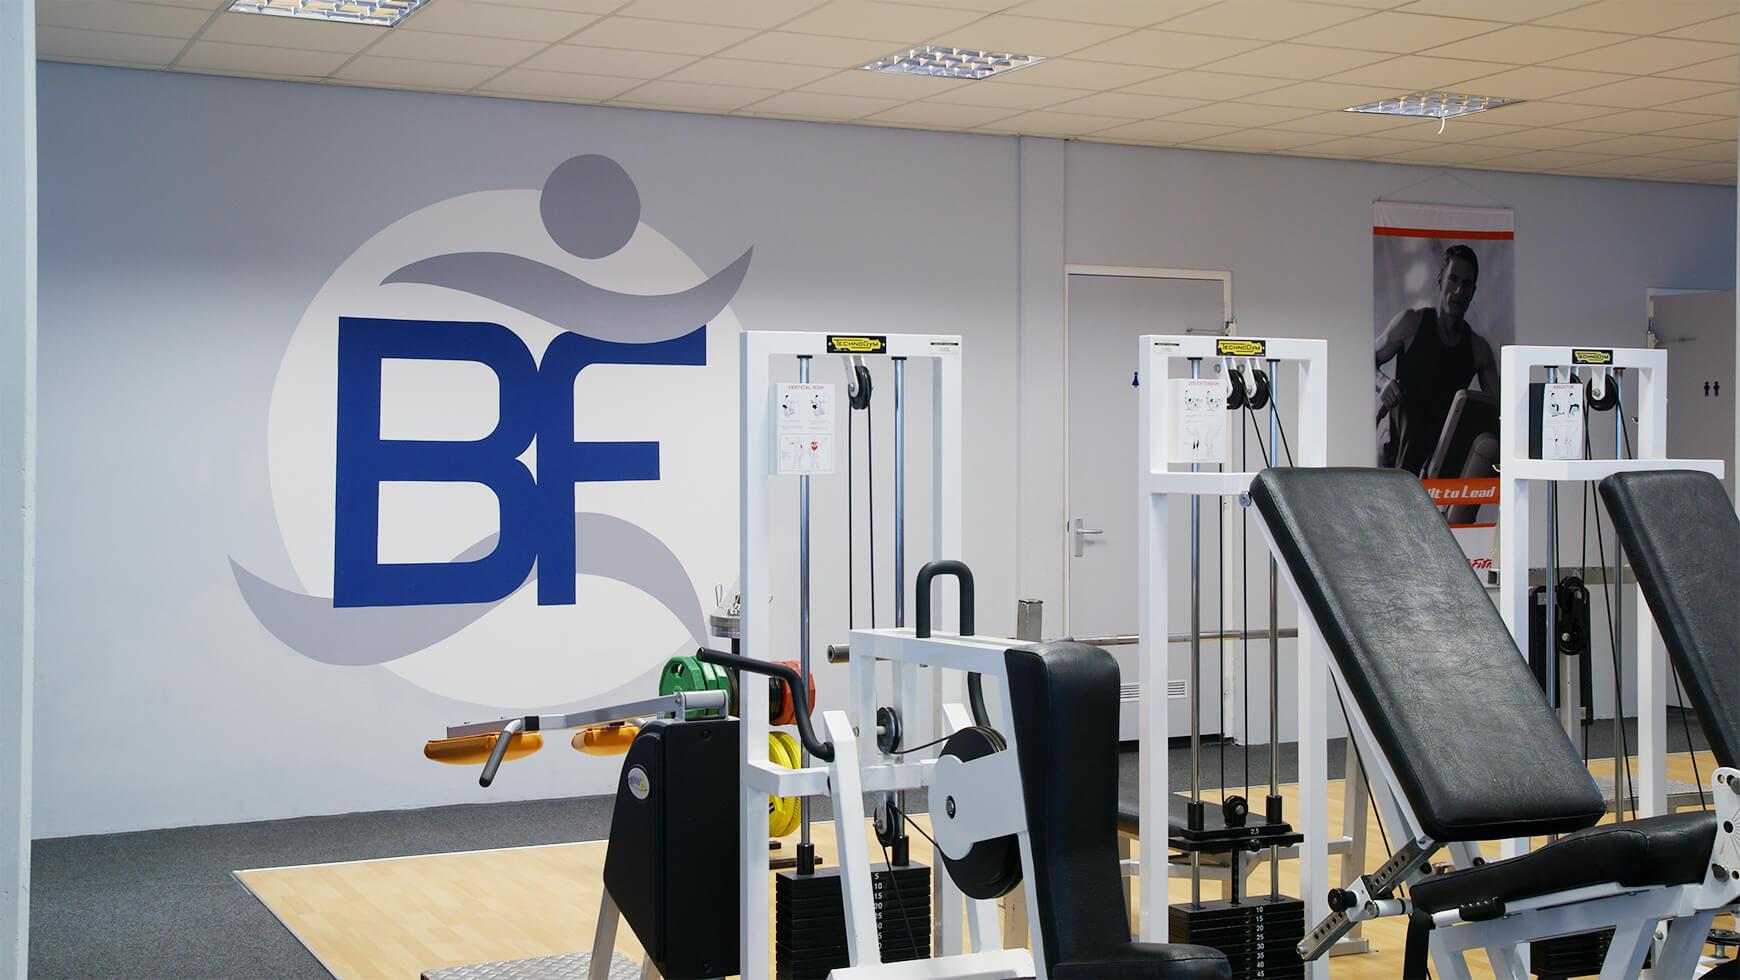 Logo in Fitnessruimte Sportcentrum Bfit